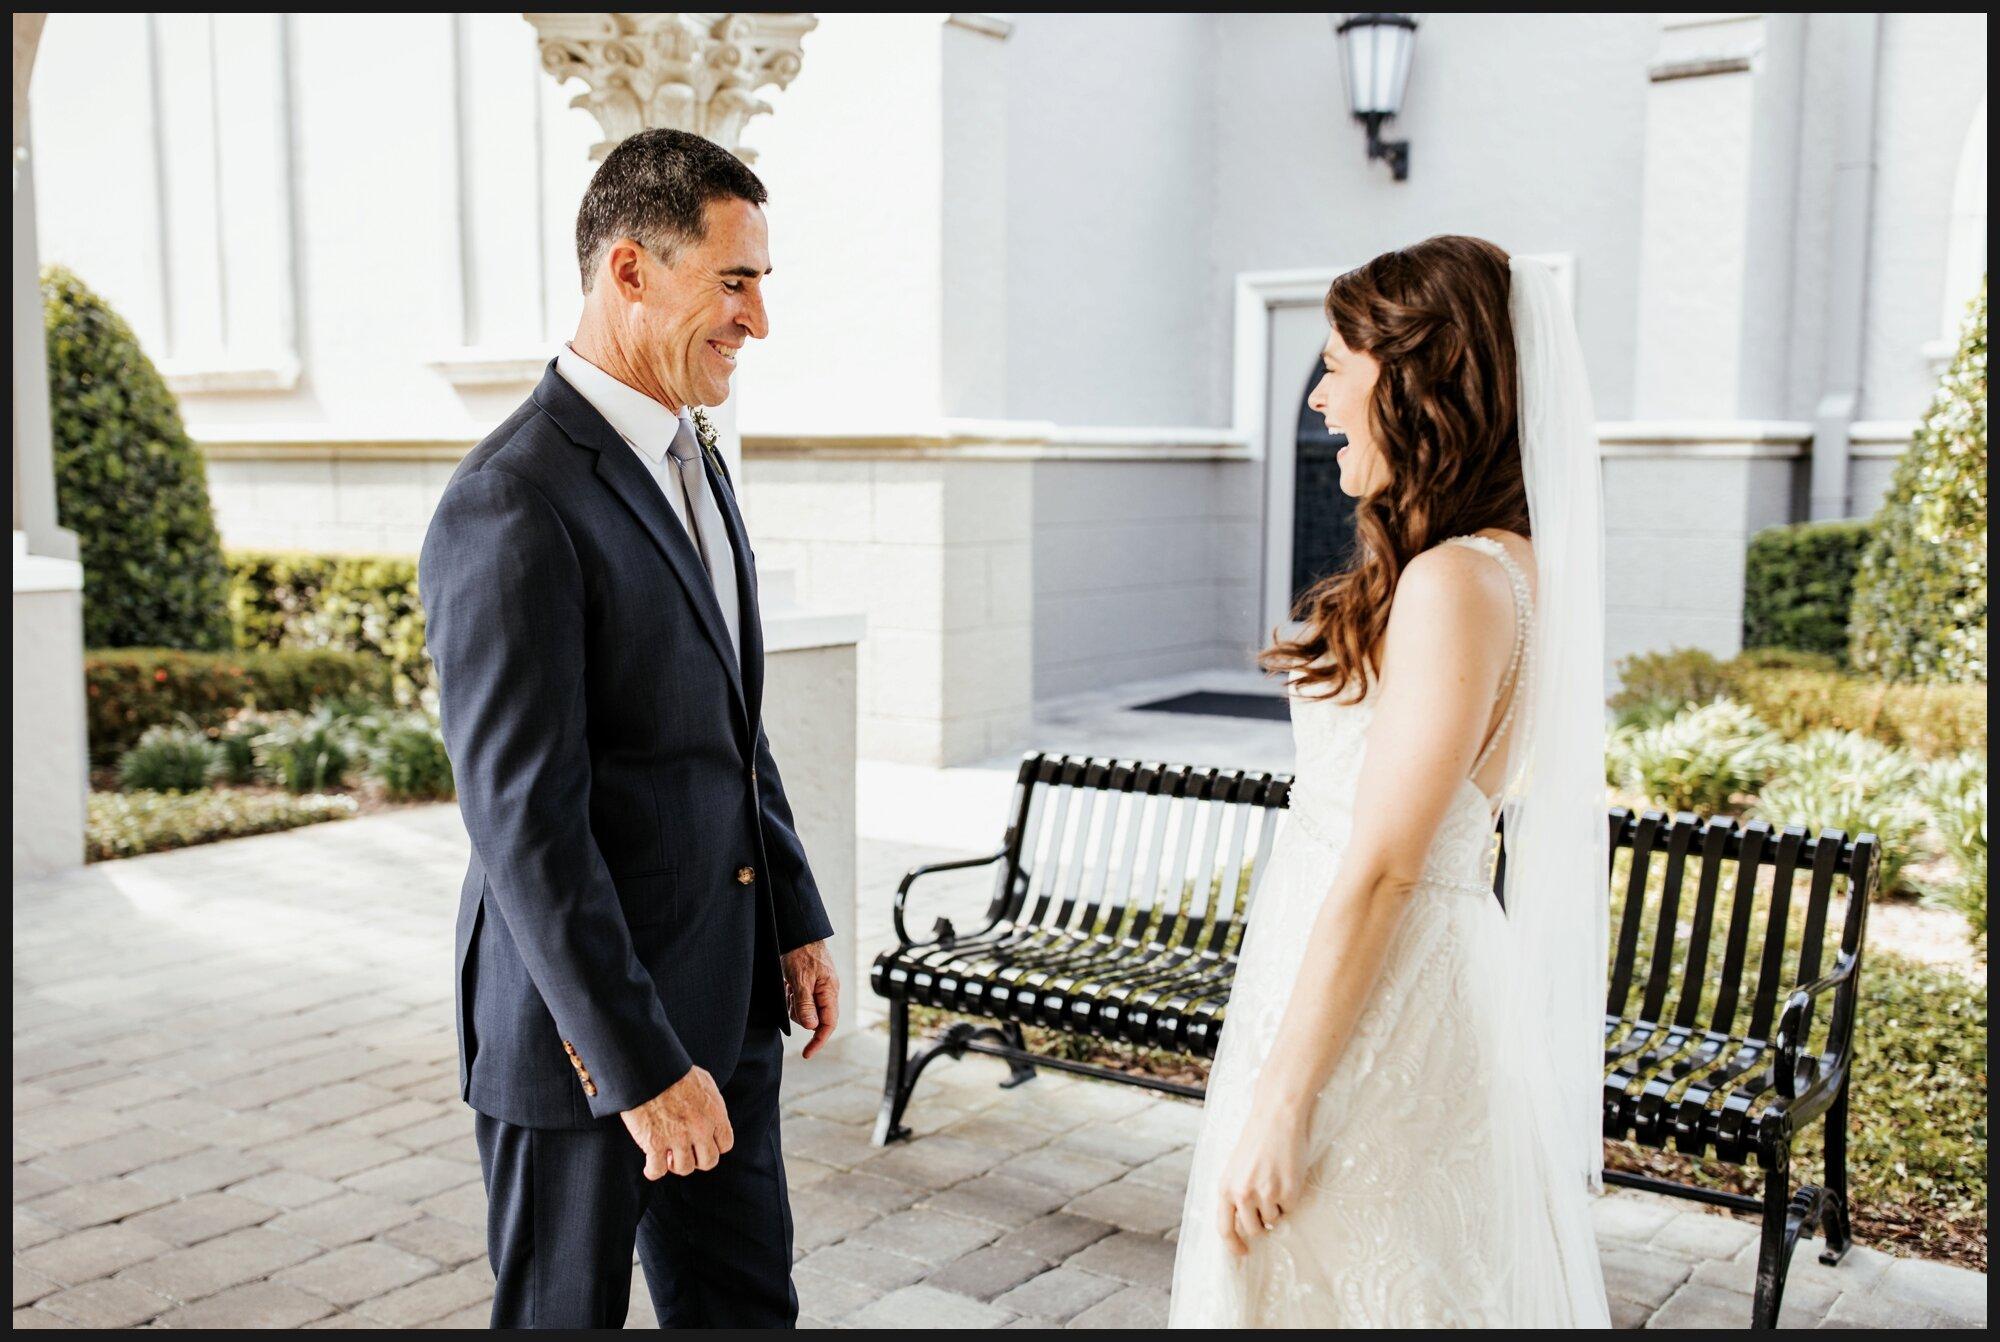 Orlando-Wedding-Photographer-destination-wedding-photographer-florida-wedding-photographer-hawaii-wedding-photographer_0675.jpg